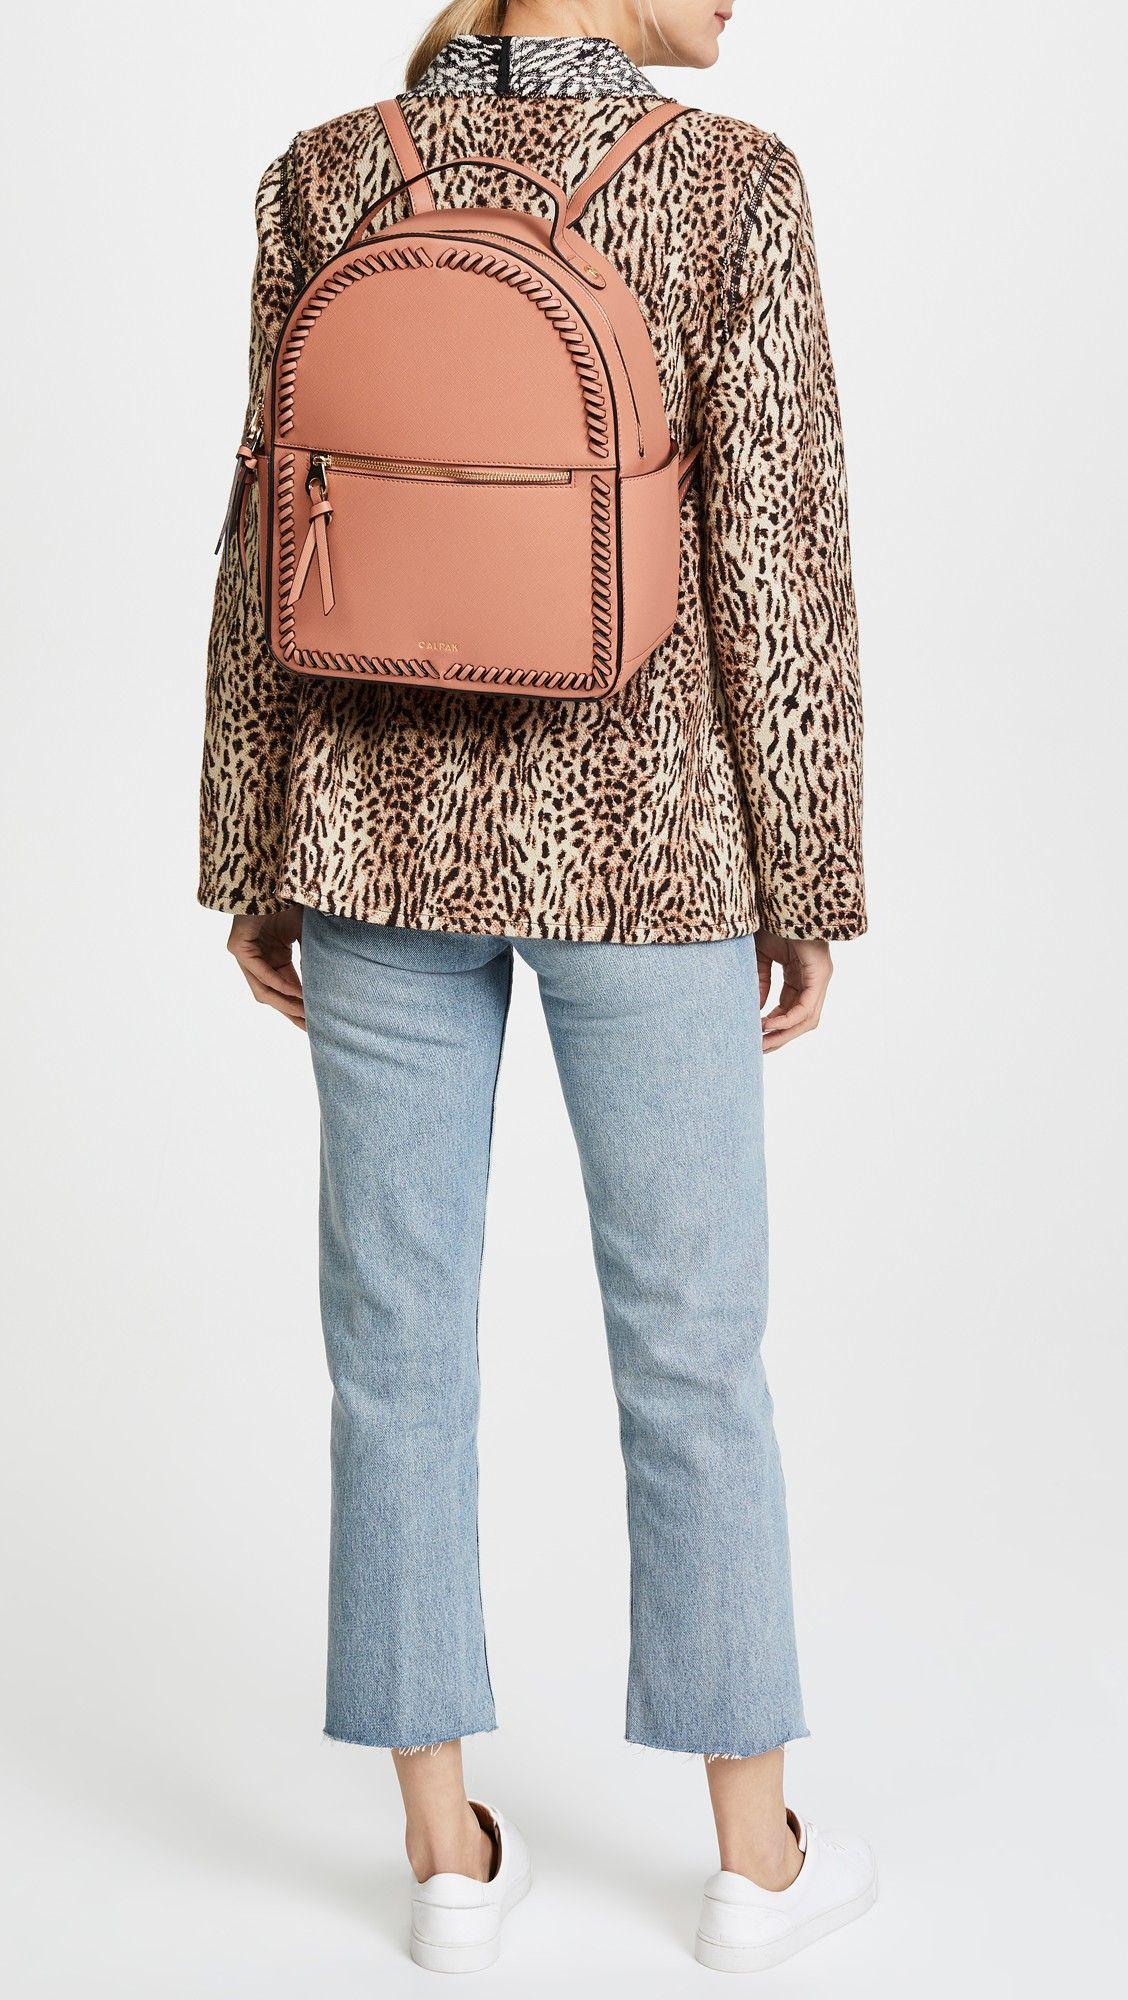 76b55c432 Kaya Travel Backpack   P A C K   Travel backpack, Backpacks, Leather ...